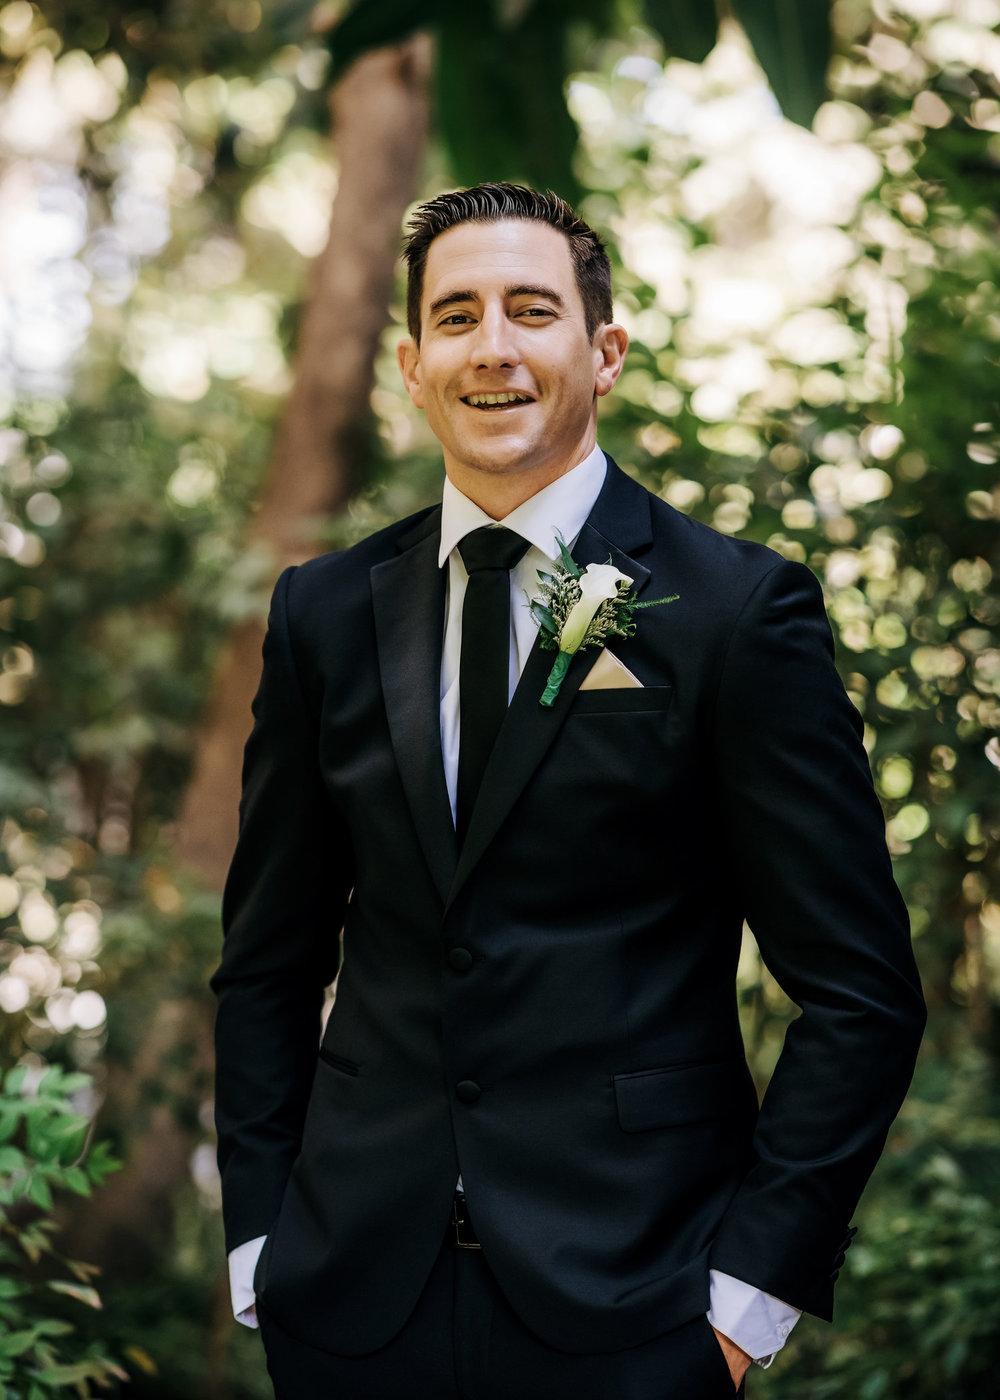 Turchin_20180825_Austinae-Brent-Wedding_088.jpg